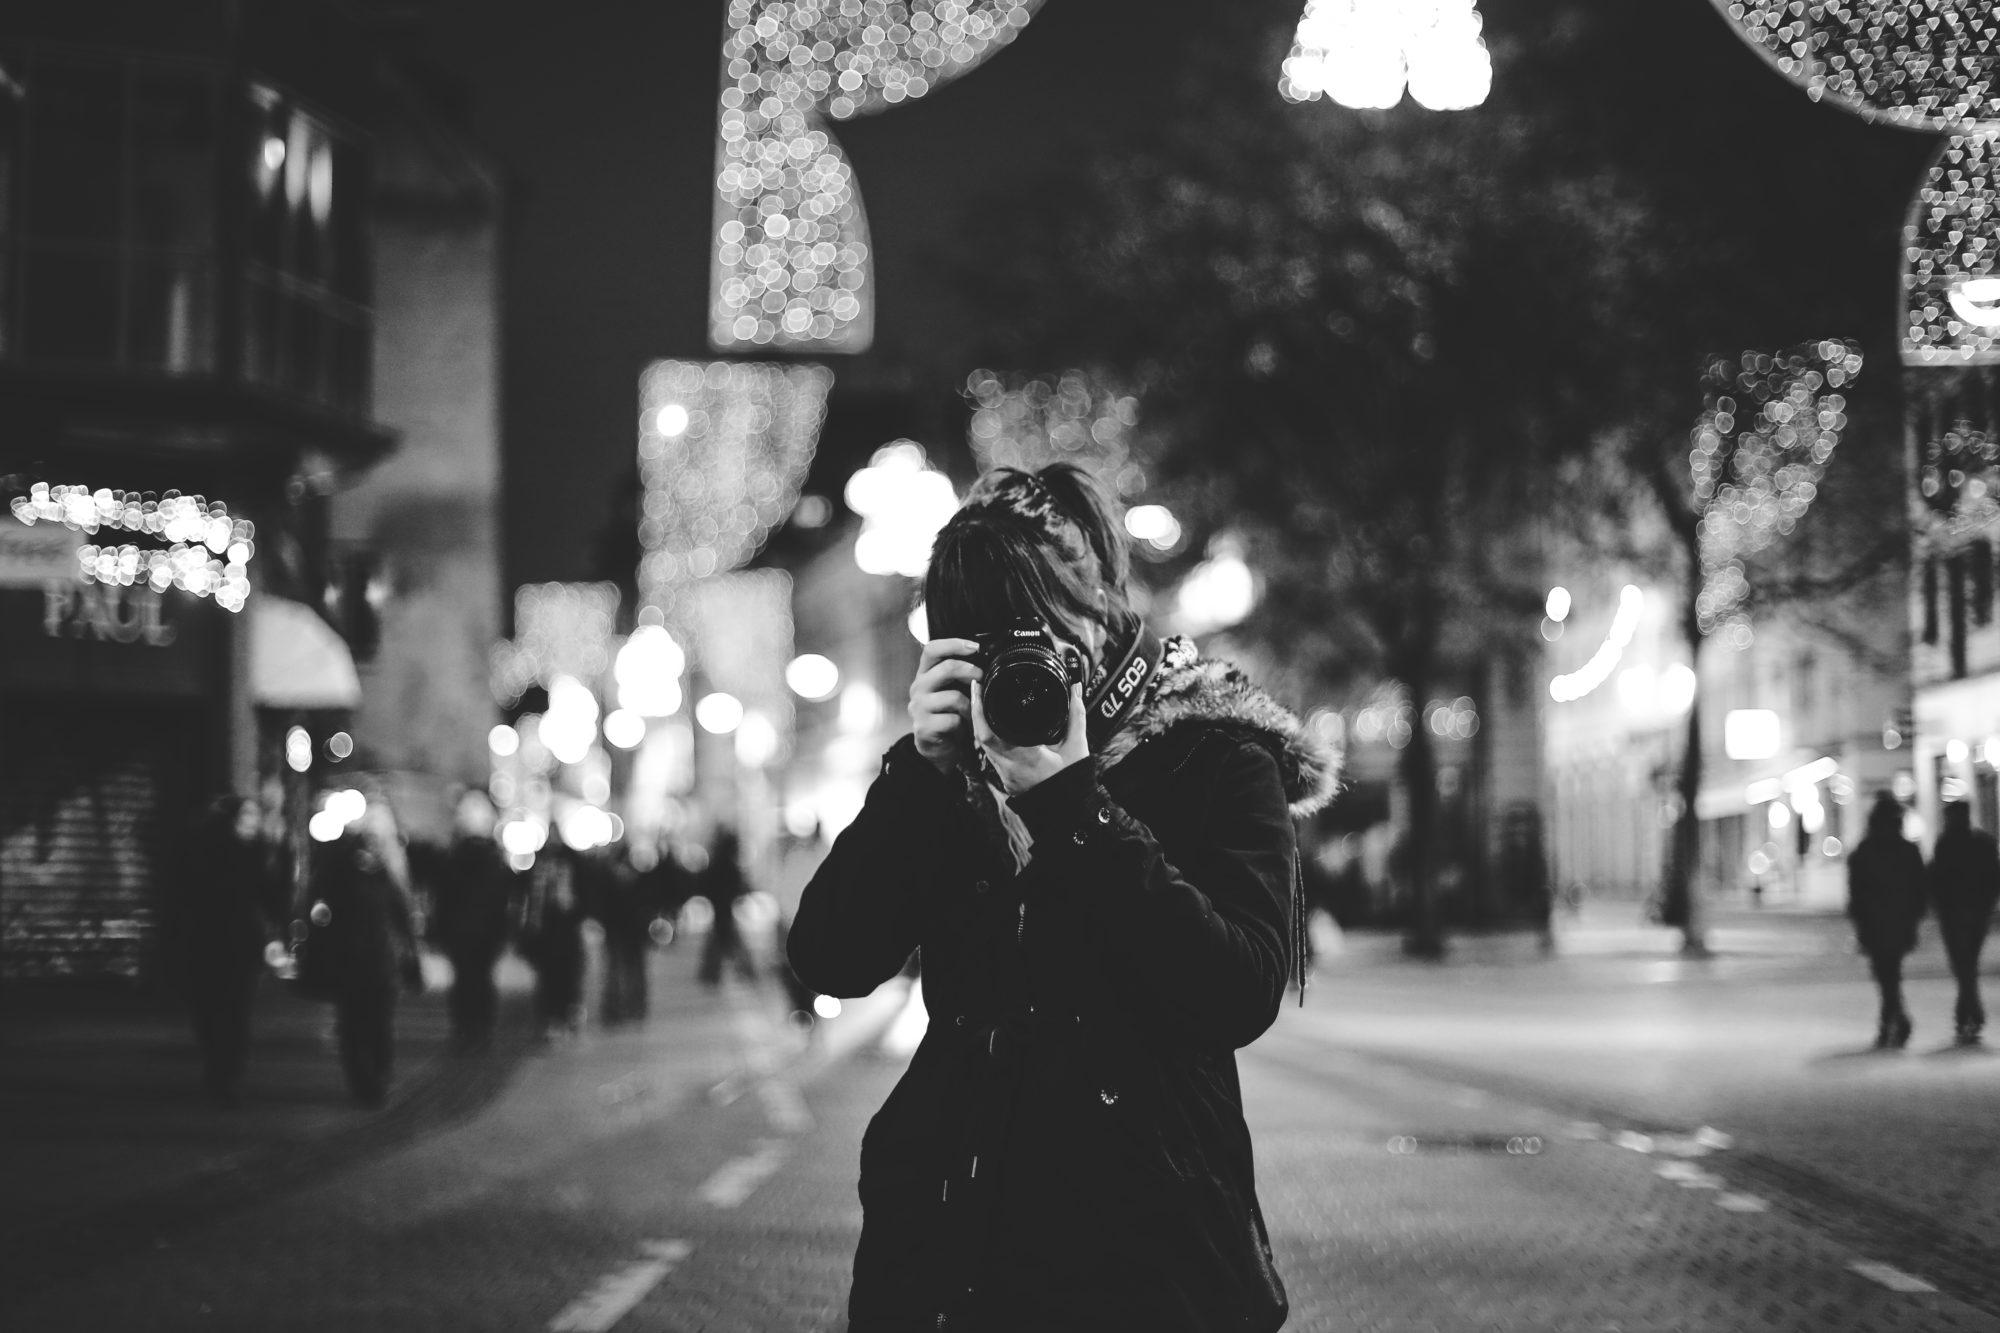 kasuma-streetphotography-travel-blog-strasbourg-christmas-2015-15